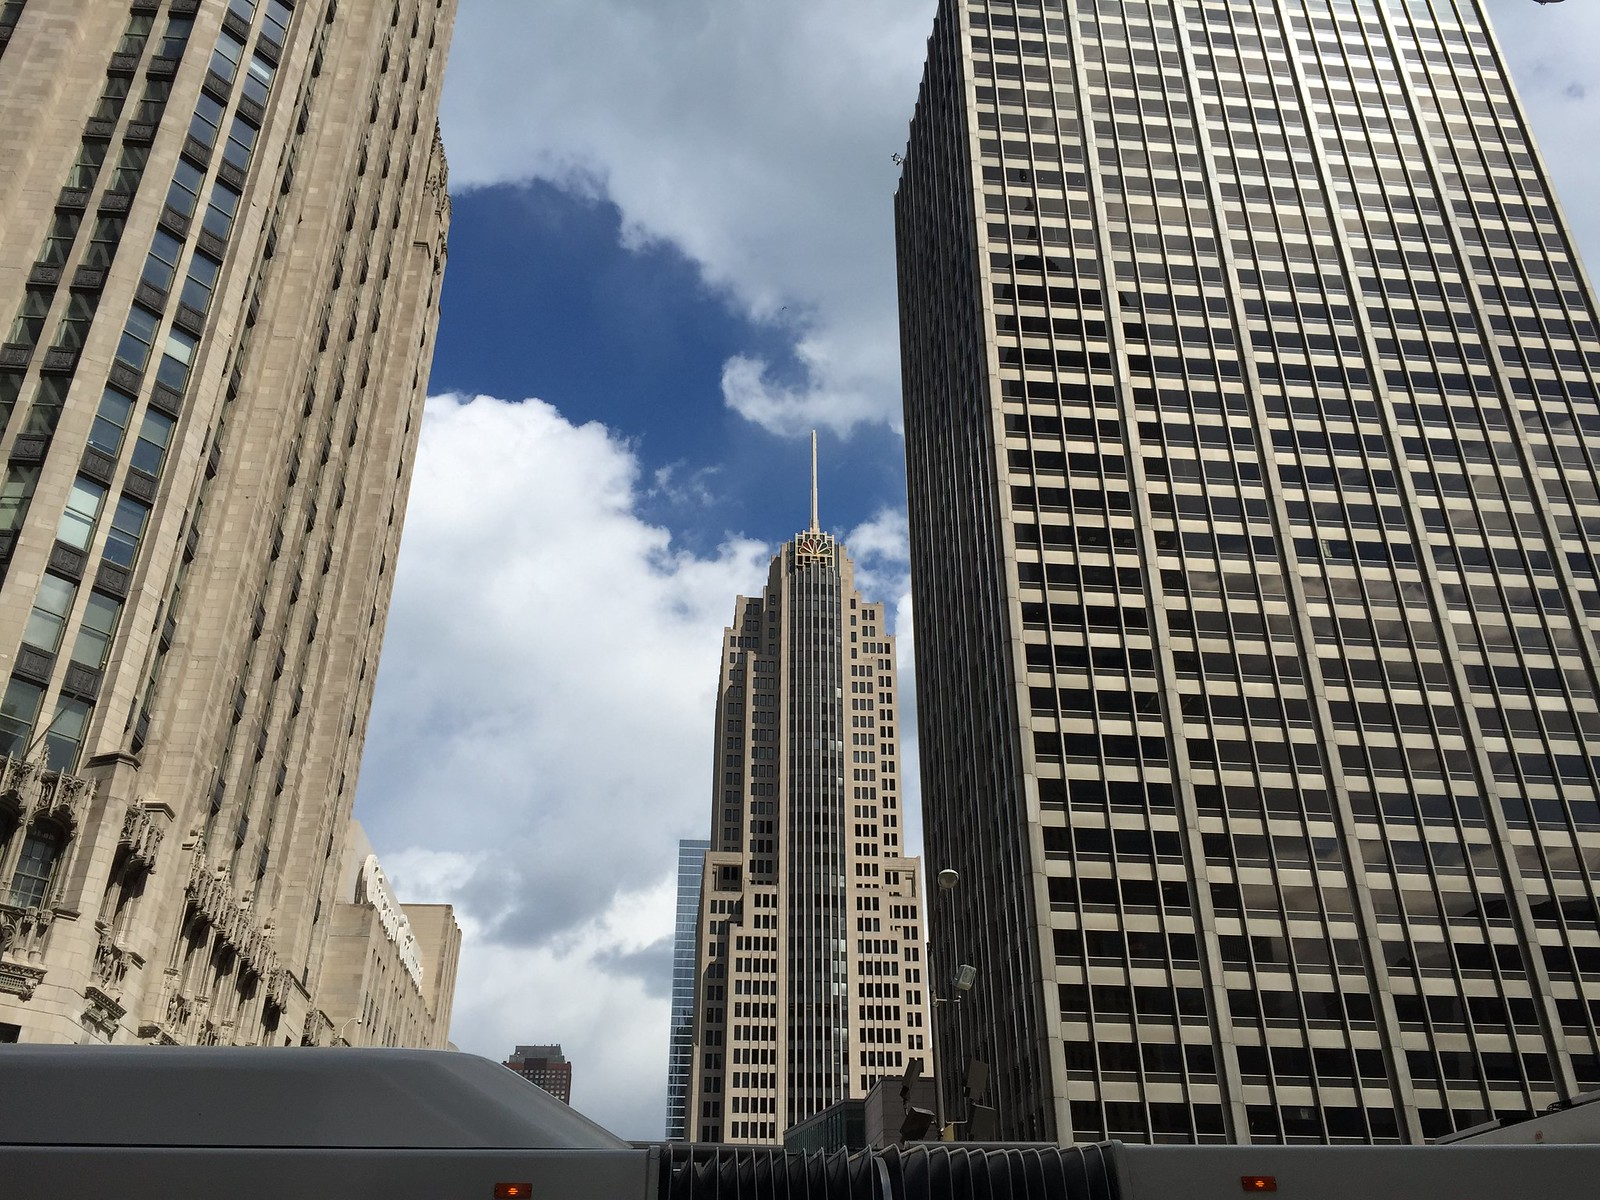 Chicago 21-04-2015 14-29-51